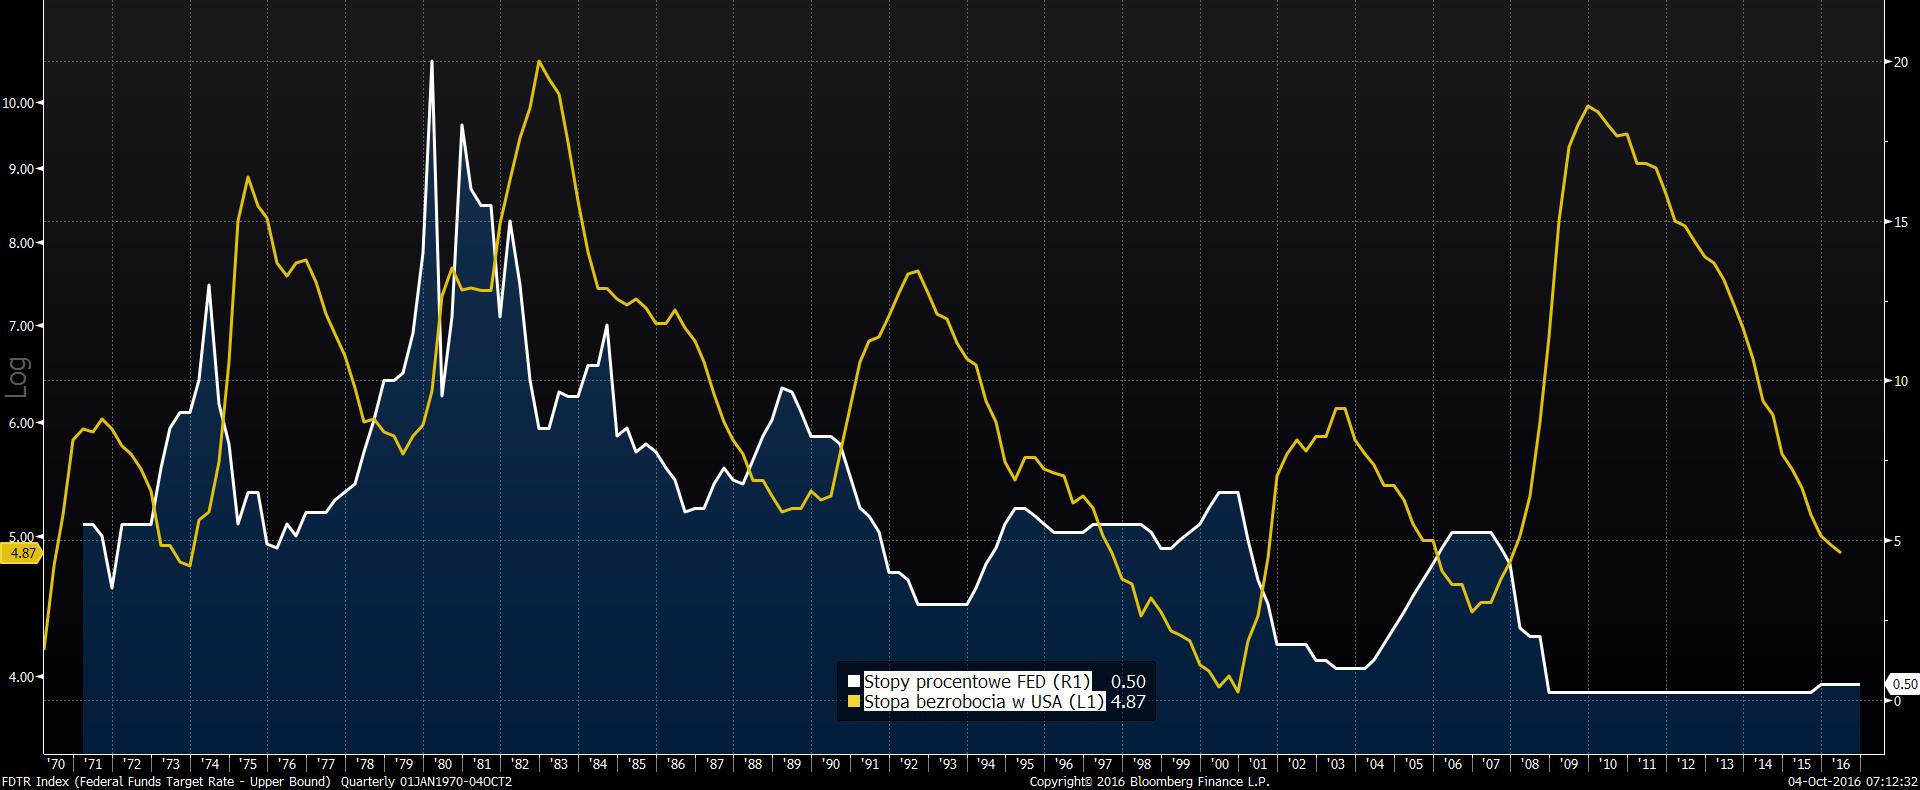 Stopy procentowe FED na tle stopy bezrobocia USA